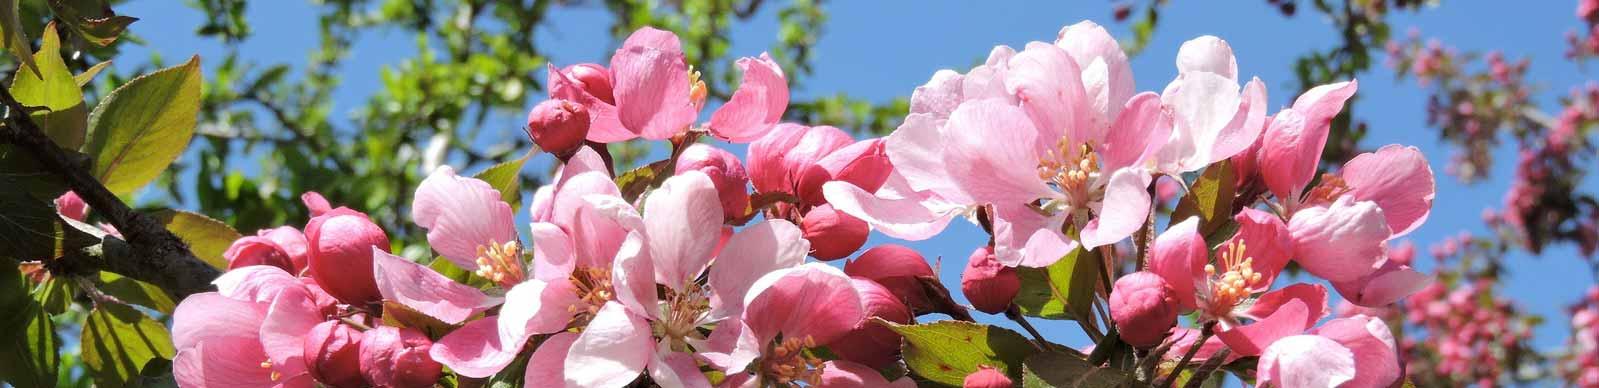 Pommiers en fleurs Normandie